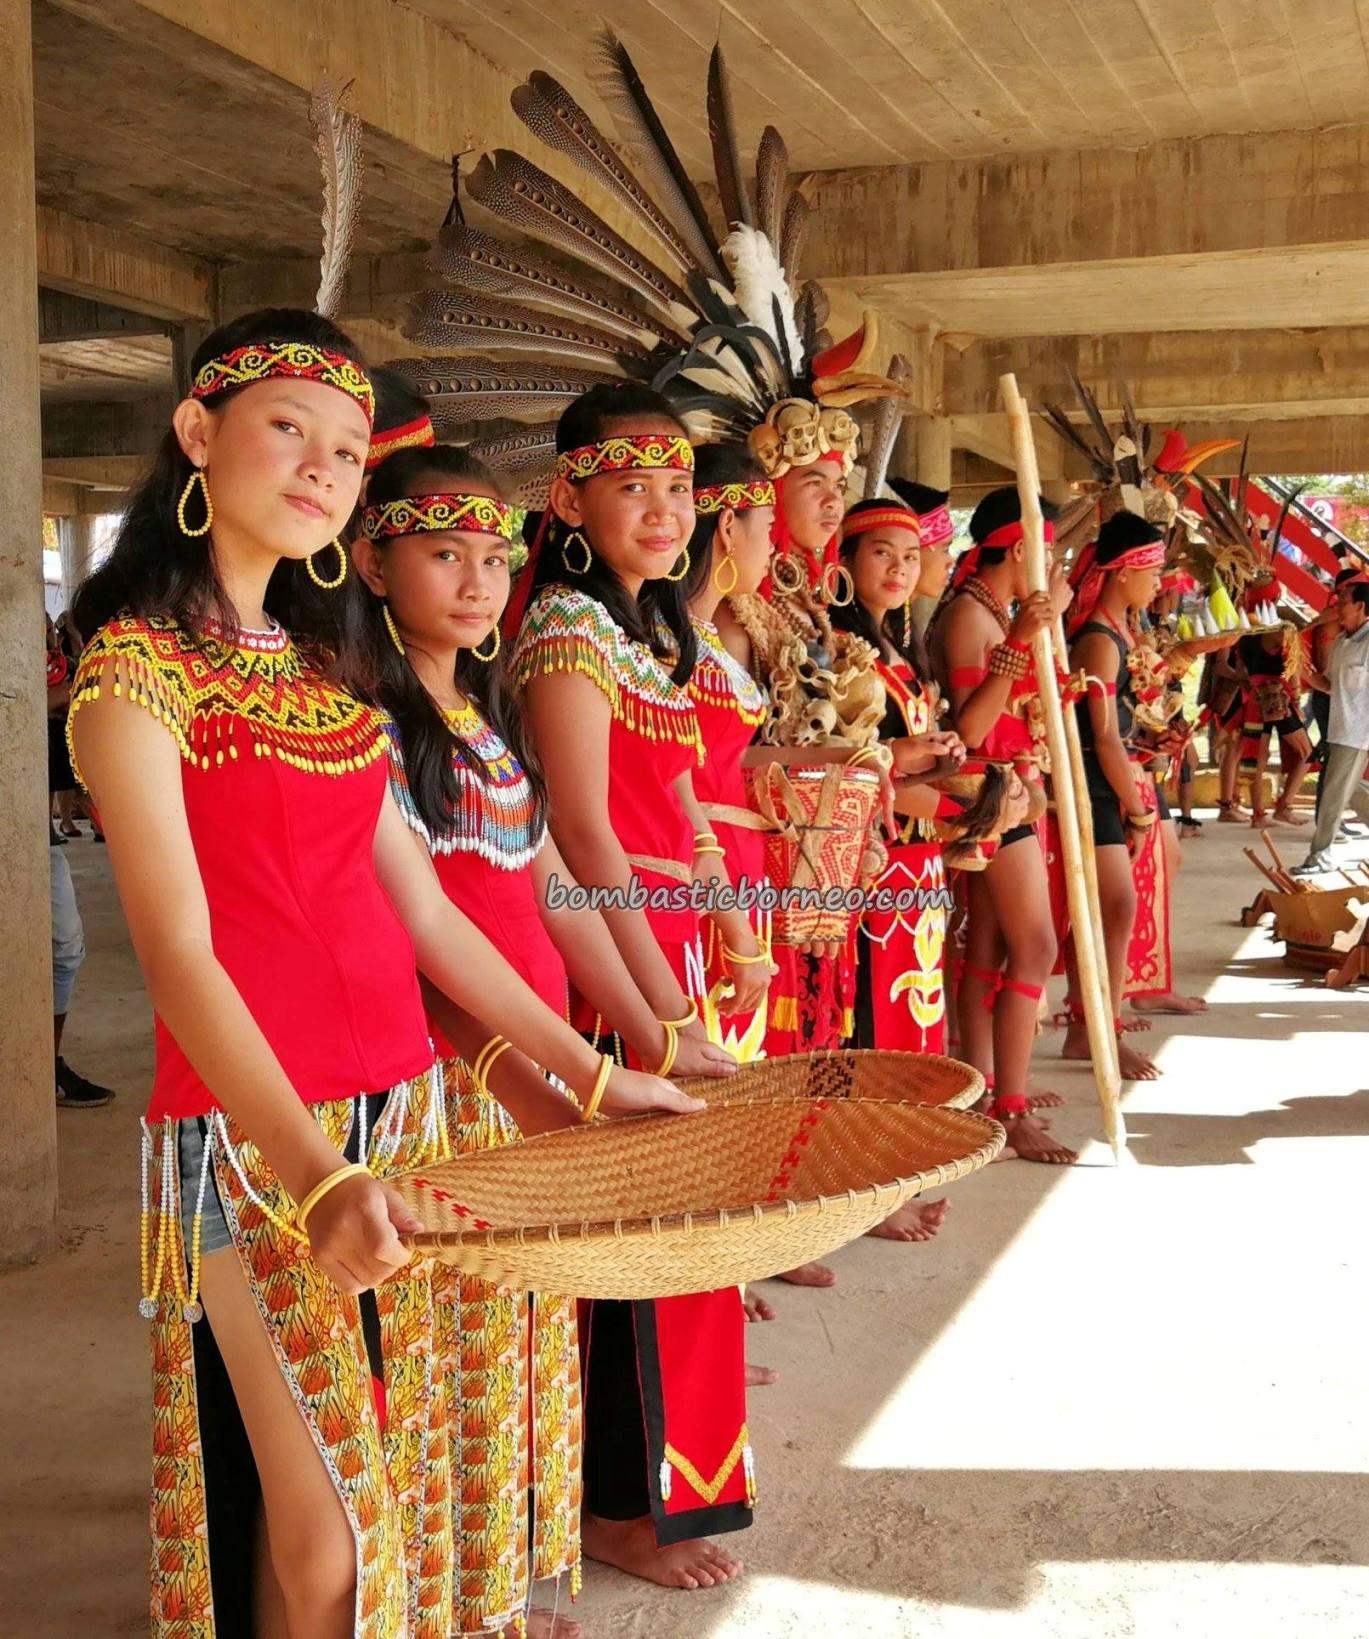 Rumah Betang Raya Dori Mpulor, Gawai Dayak Sanggau, paddy harvest festival, indigenous, authentic, backpackers, culture, Indonesia, Kalimantan Barat, native, tribe, tourist attraction, Tourism, travel guide, trans borneo,